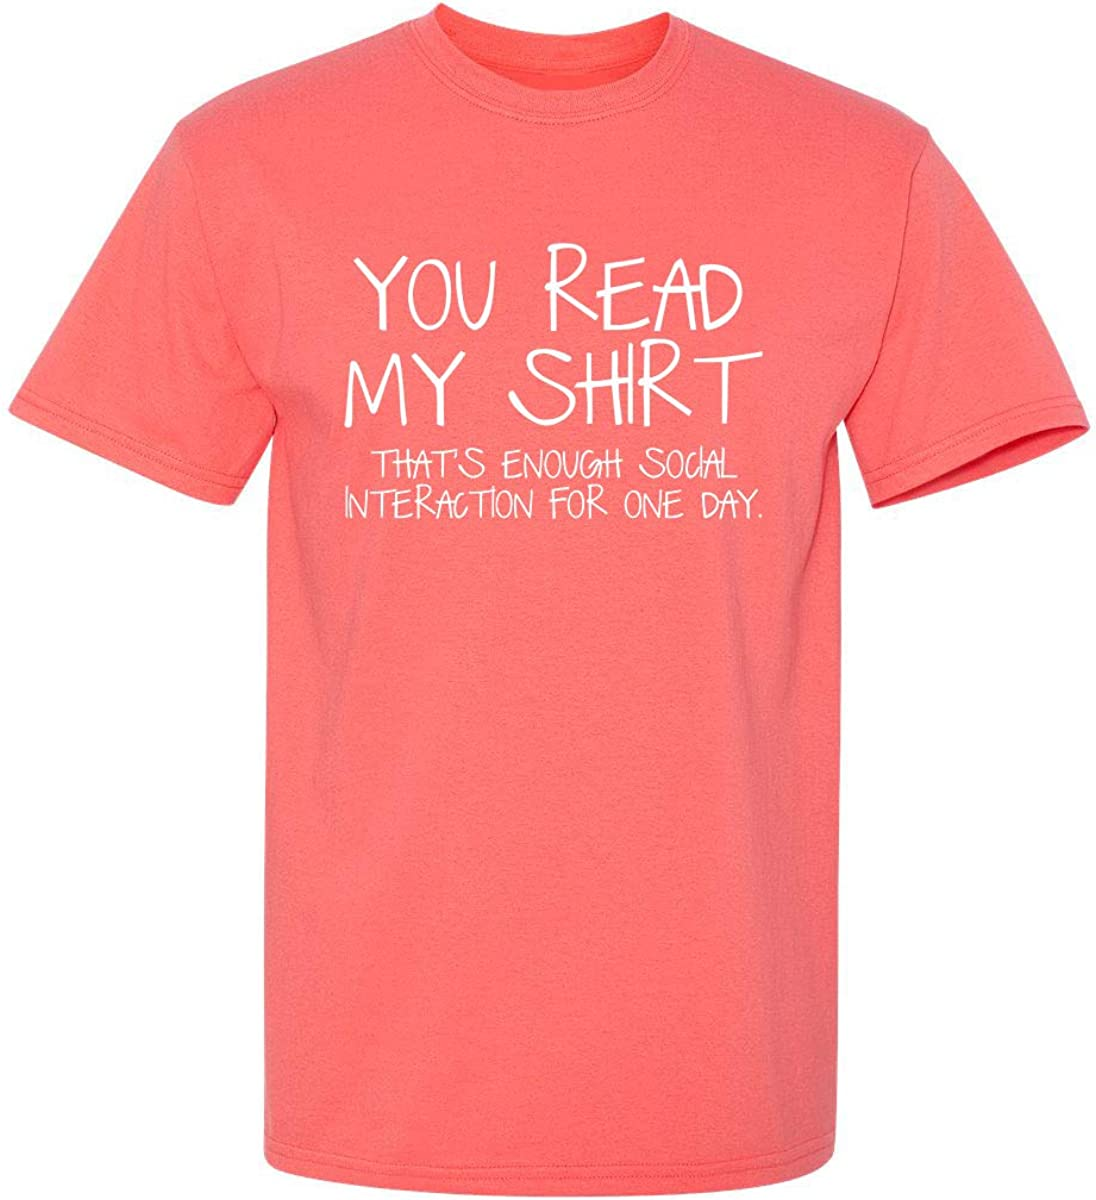 Enough Social Interaction Graphic Novelty Sarcastic Funny T Shirt